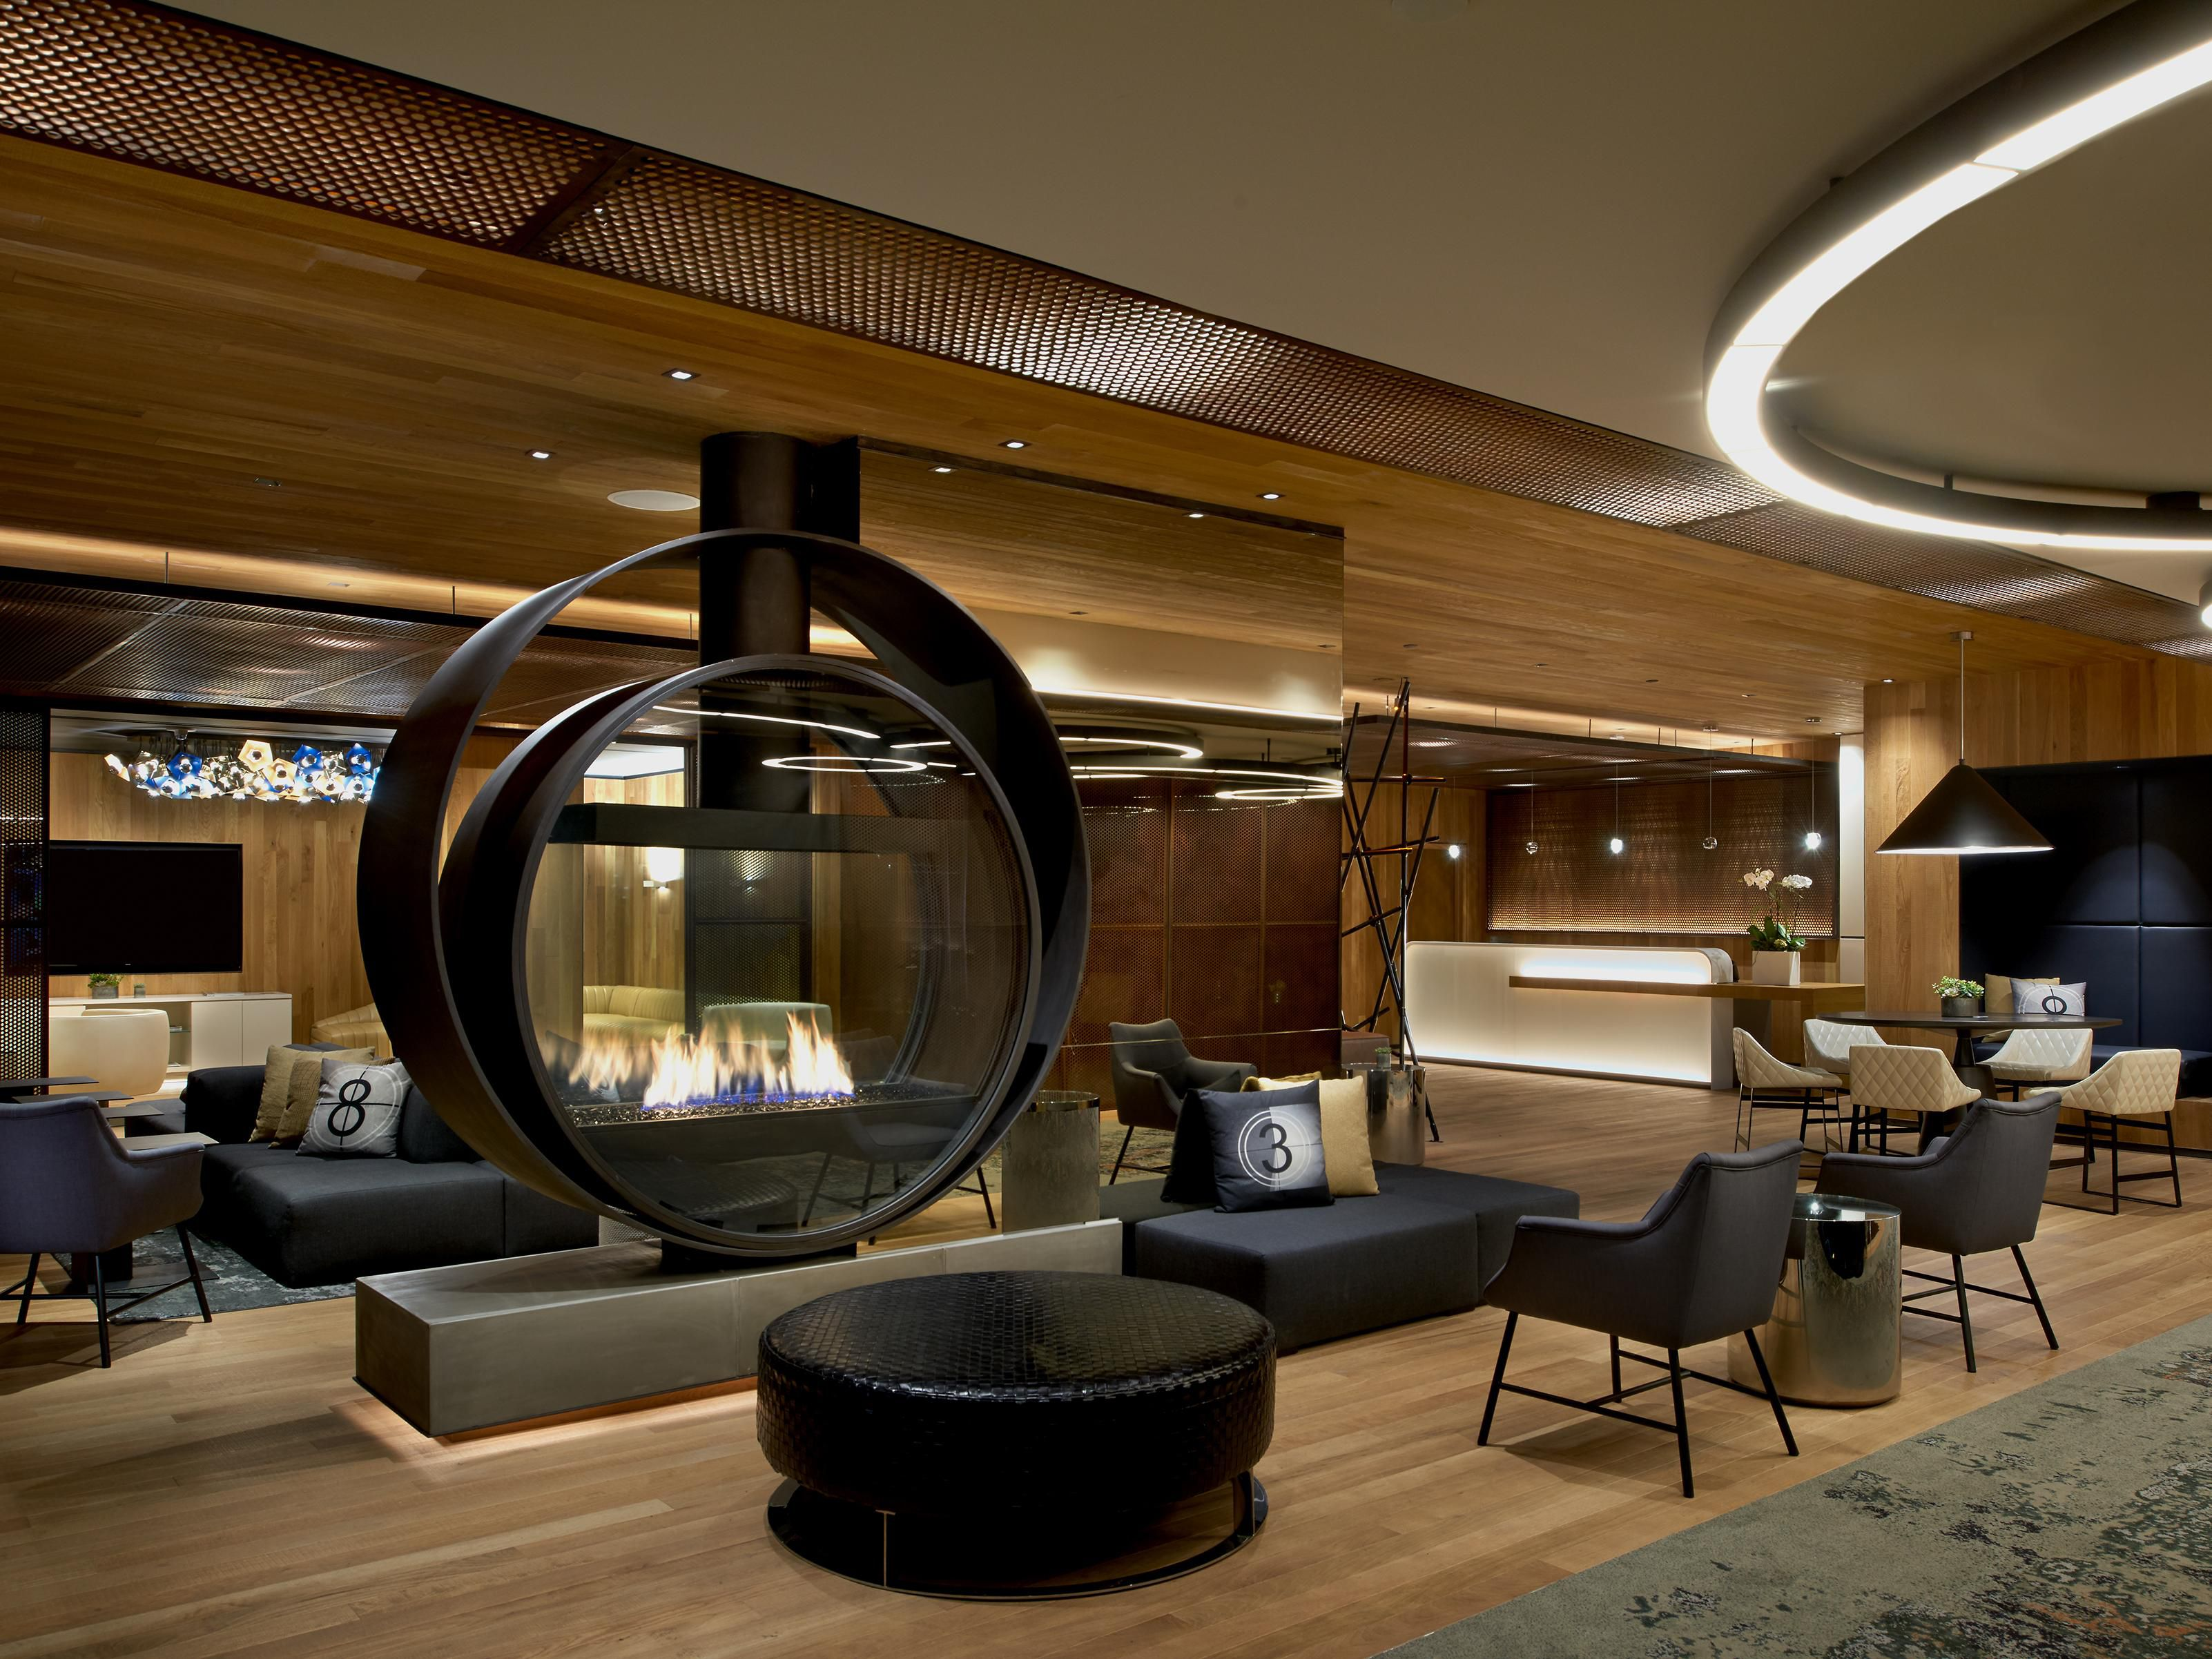 Hotels in Los Angeles suchen   Die besten 69 Hotels in Los Angeles ...